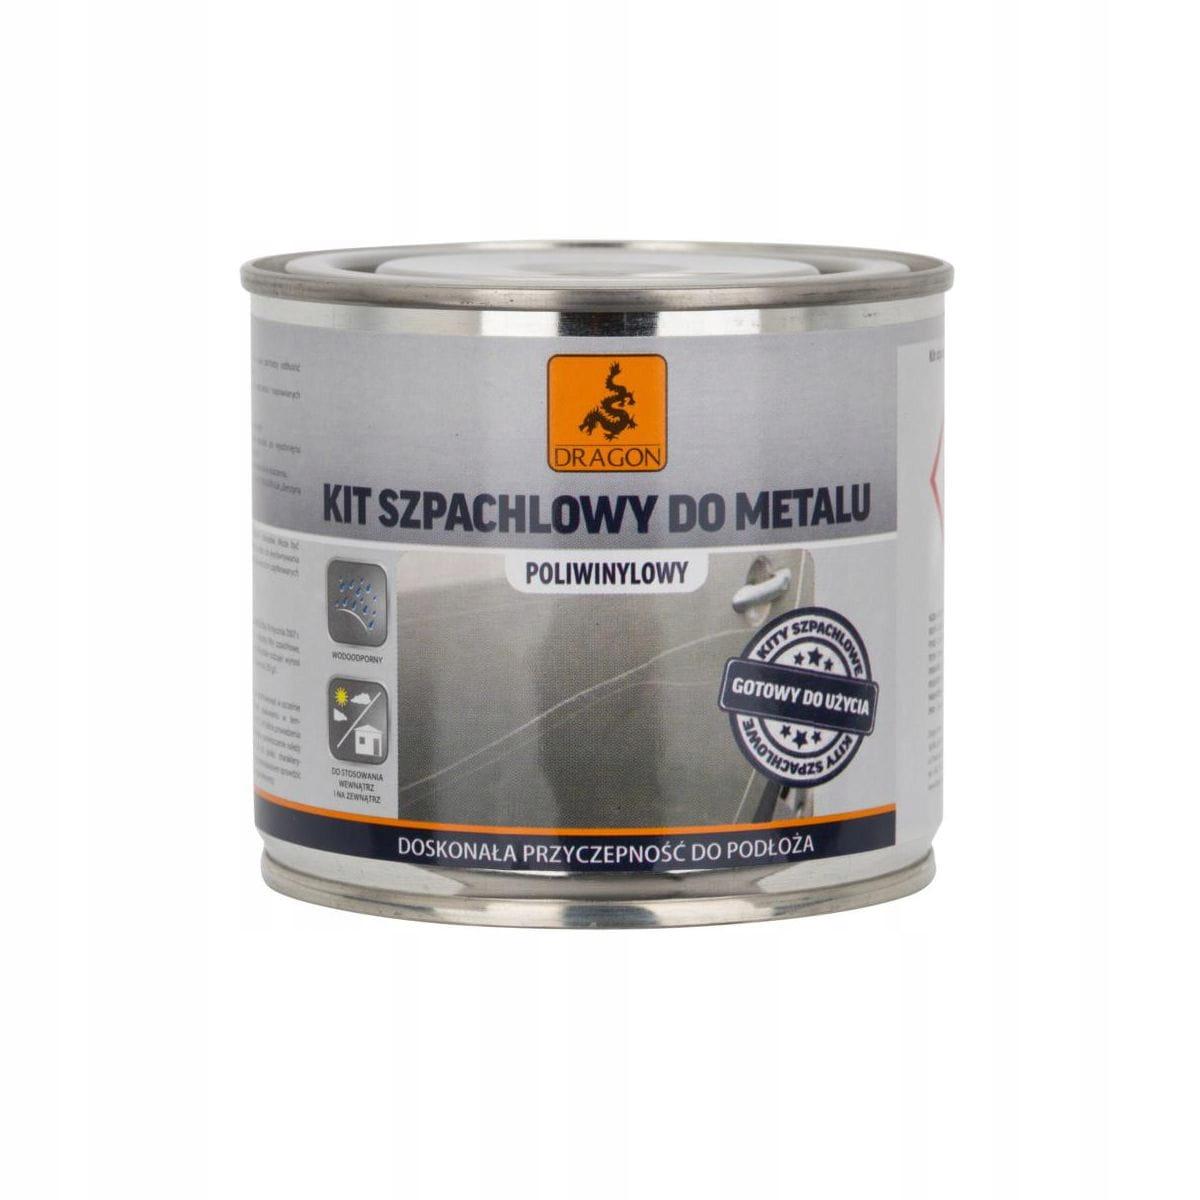 Шпатлевка по металлу 0,25 кг ДРАКОН